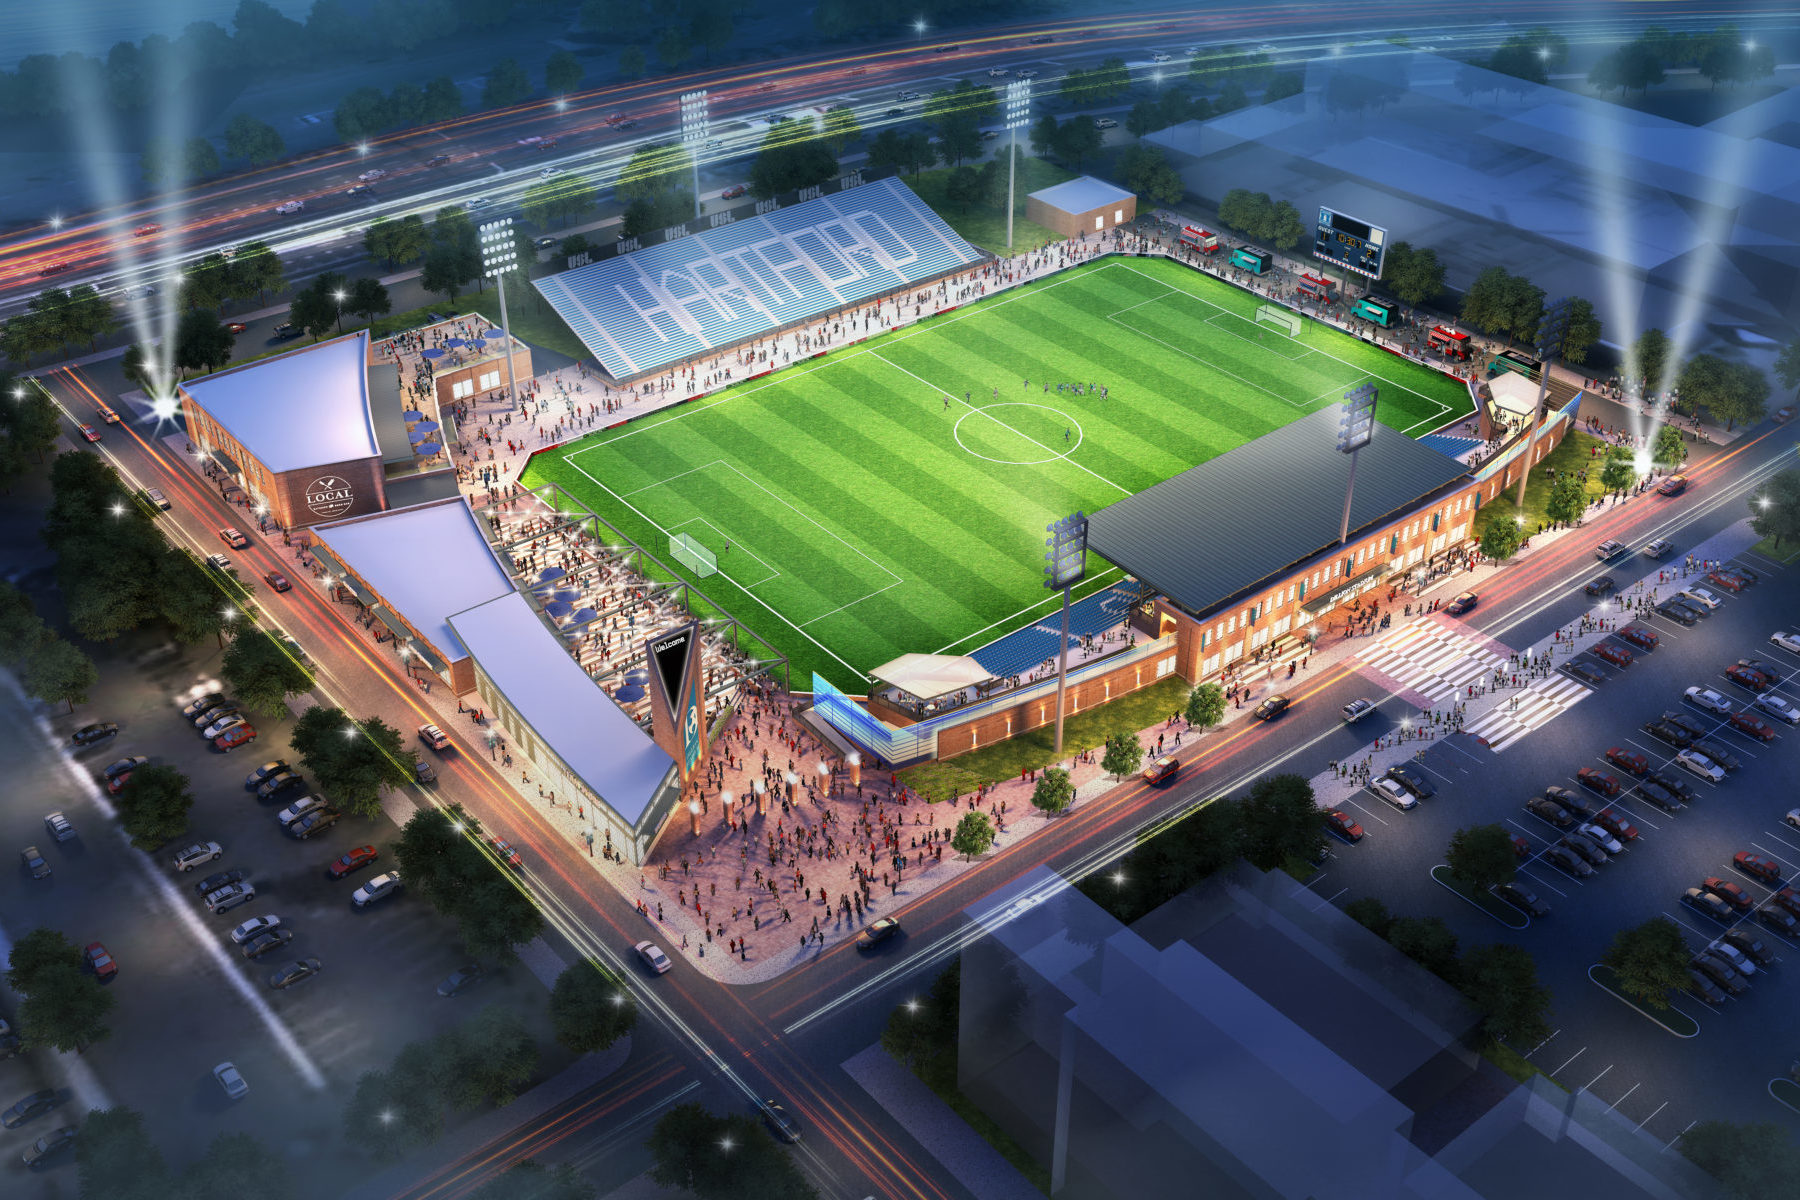 Dillon Stadium Odell Architecture